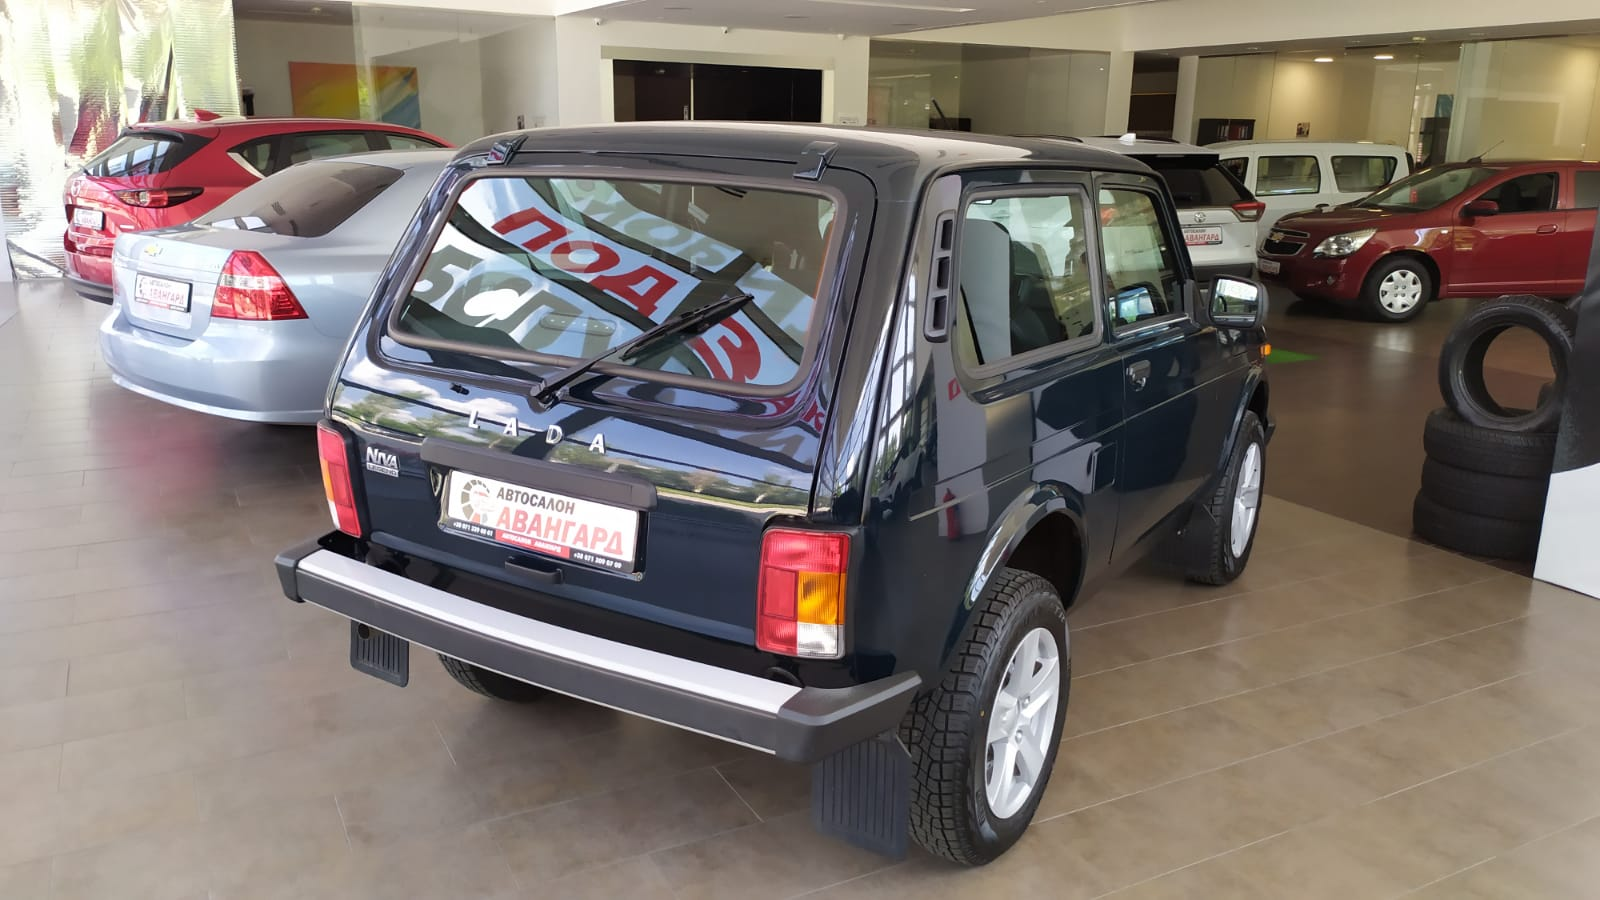 Lada Niva Legend 3дв. 1.7 8 кл. 83 л.с 5МТ. Luxe-Кондиционер. ТЕМНО-ЗЕЛЕНЫЙ «НЕССИ» 2021